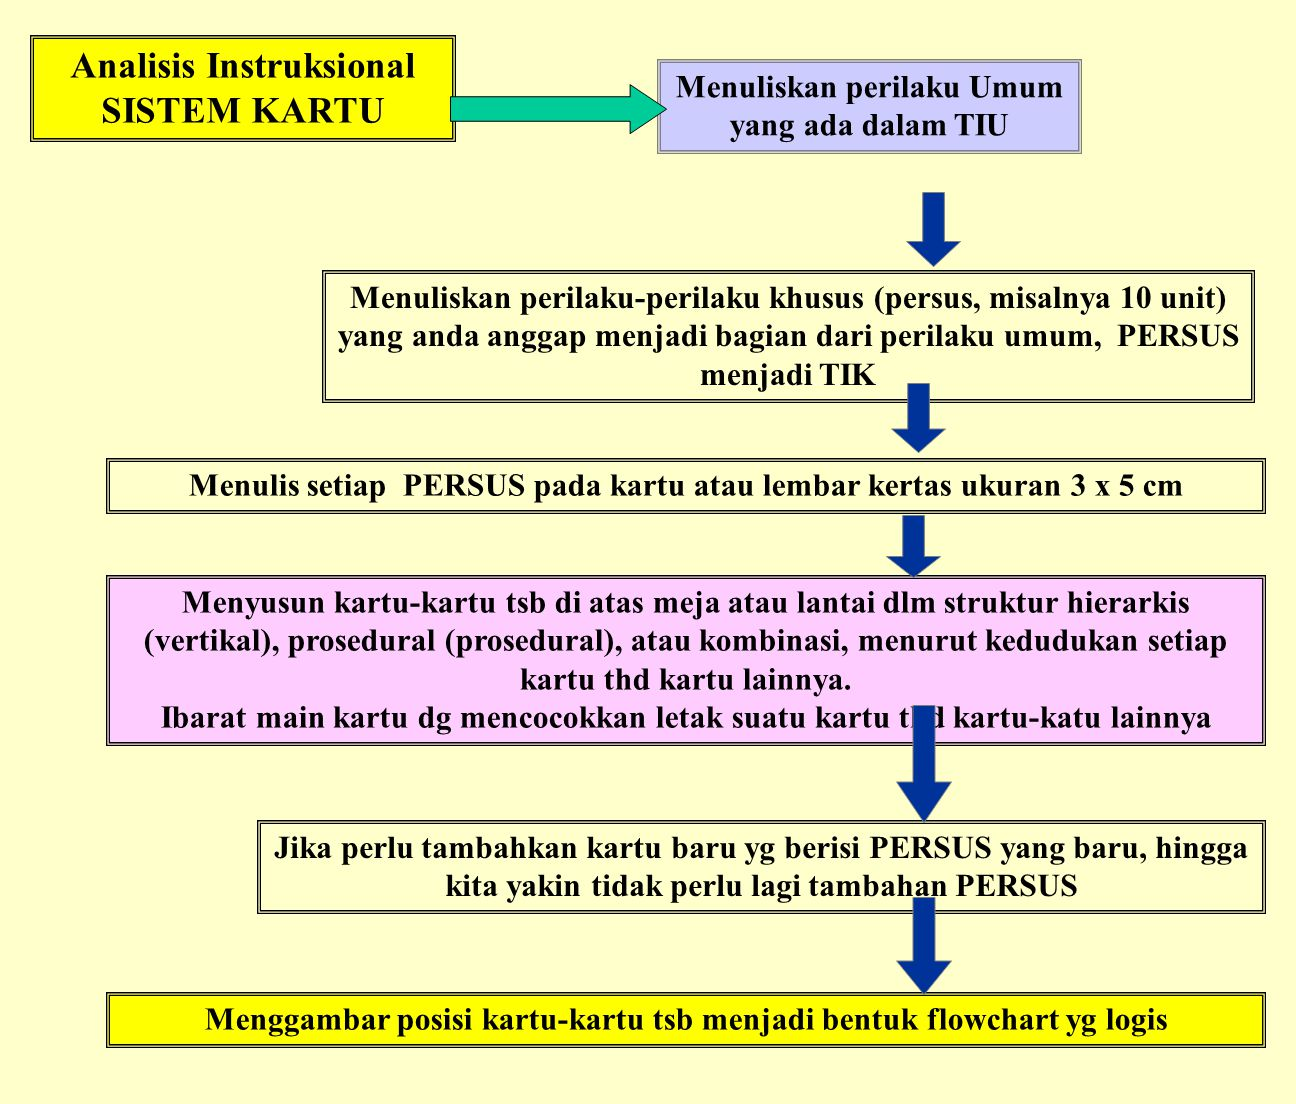 Analisis Instruksional SISTEM KARTU